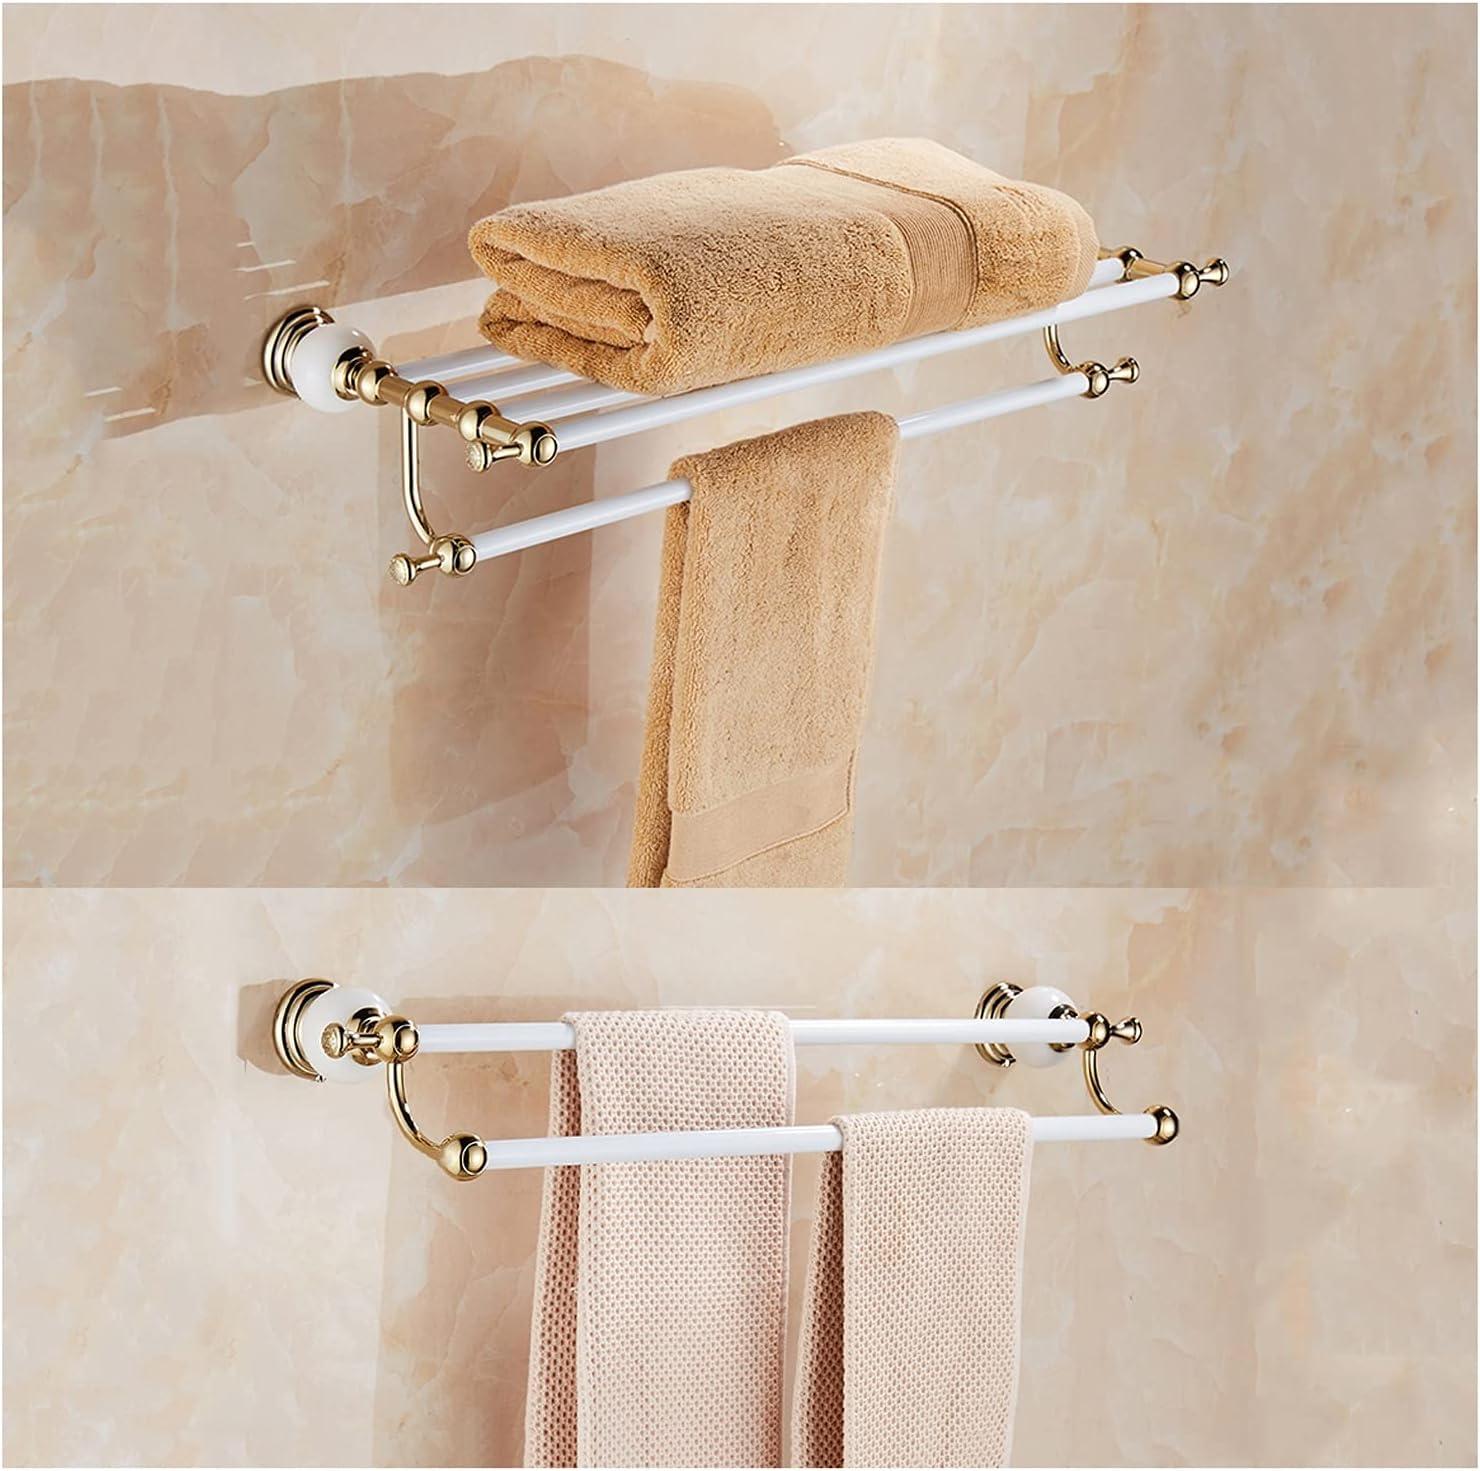 DAGCOT Shower Floating Shelves Courier shipping free Bathroom Helf Bat for Shelf Towel 2021 autumn and winter new